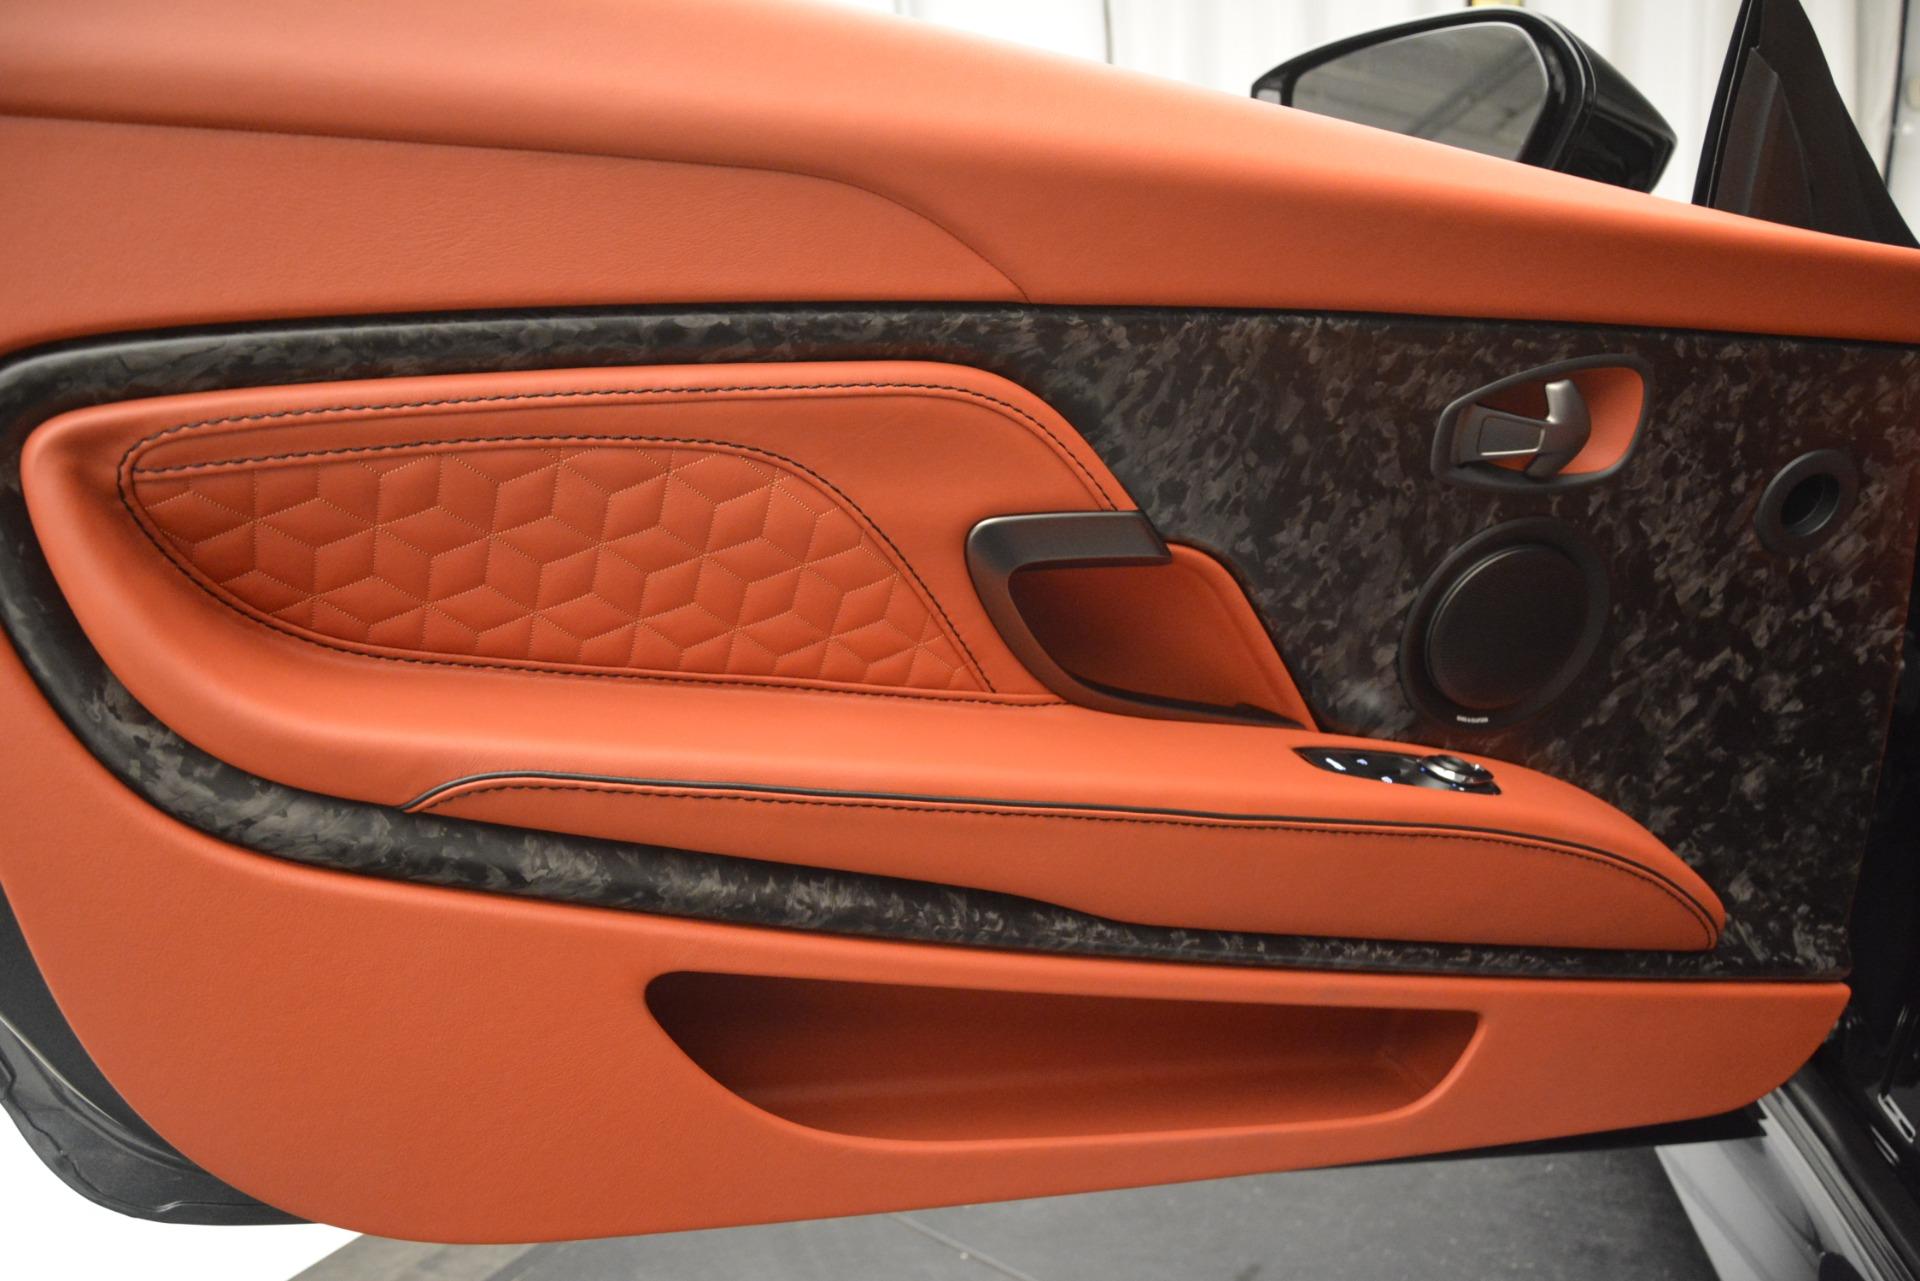 New 2019 Aston Martin DBS Superleggera For Sale In Greenwich, CT. Alfa Romeo of Greenwich, A1336 2827_p20